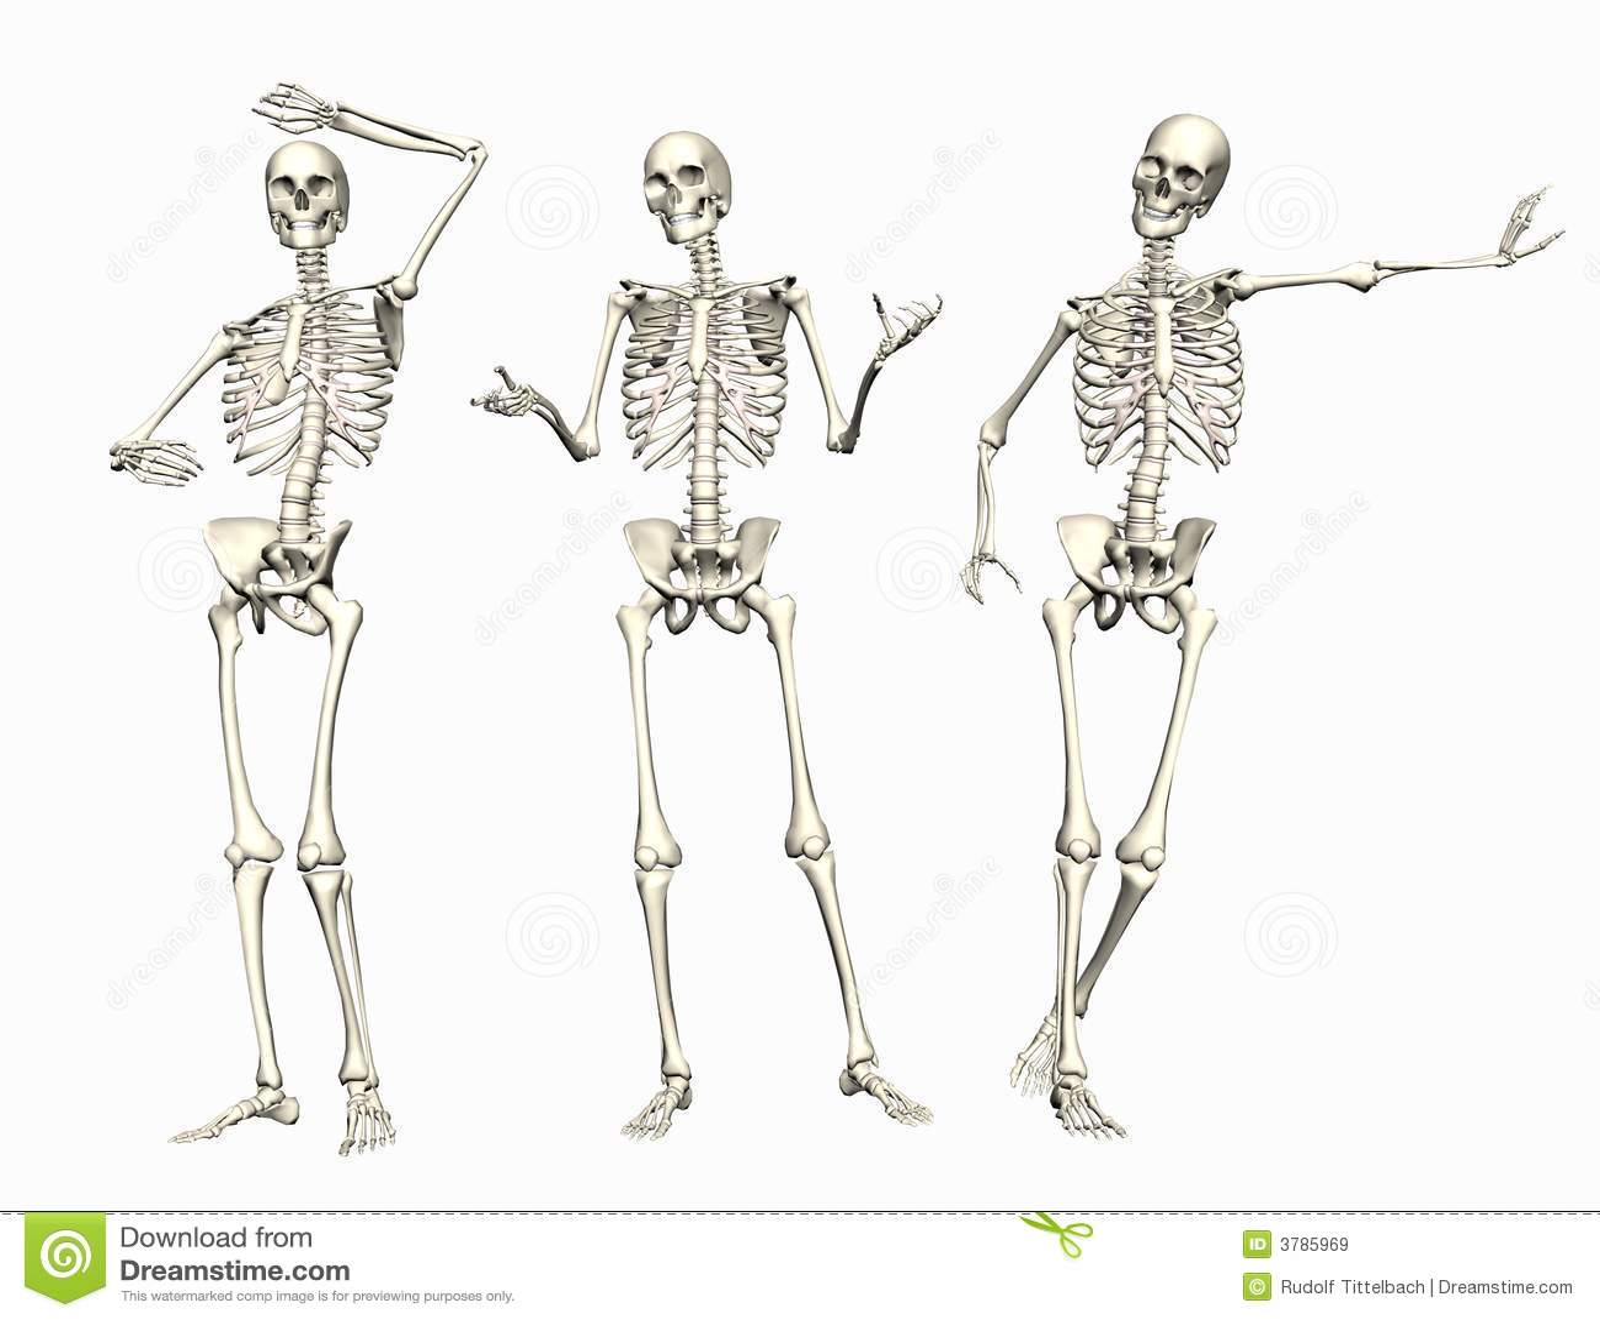 Skeletons stock illustration  Illustration of poses, posing